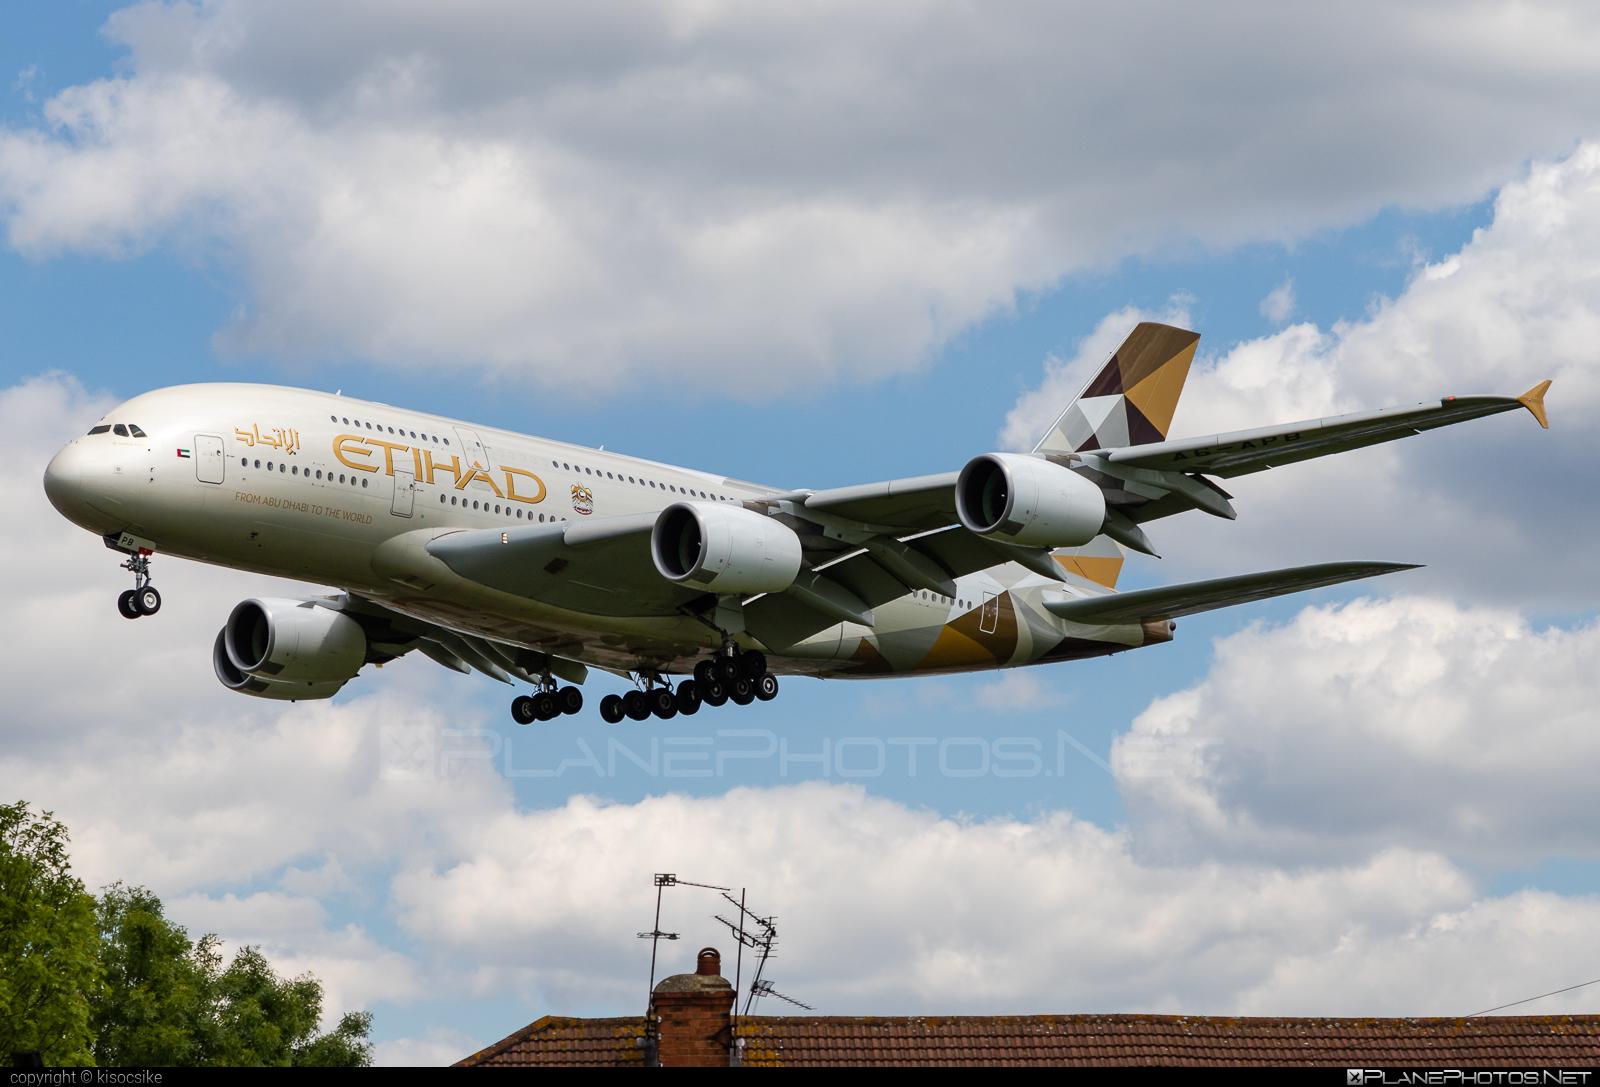 Airbus A380-861 - A6-APB operated by Etihad Airways #a380 #a380family #airbus #airbus380 #etihad #etihadairways